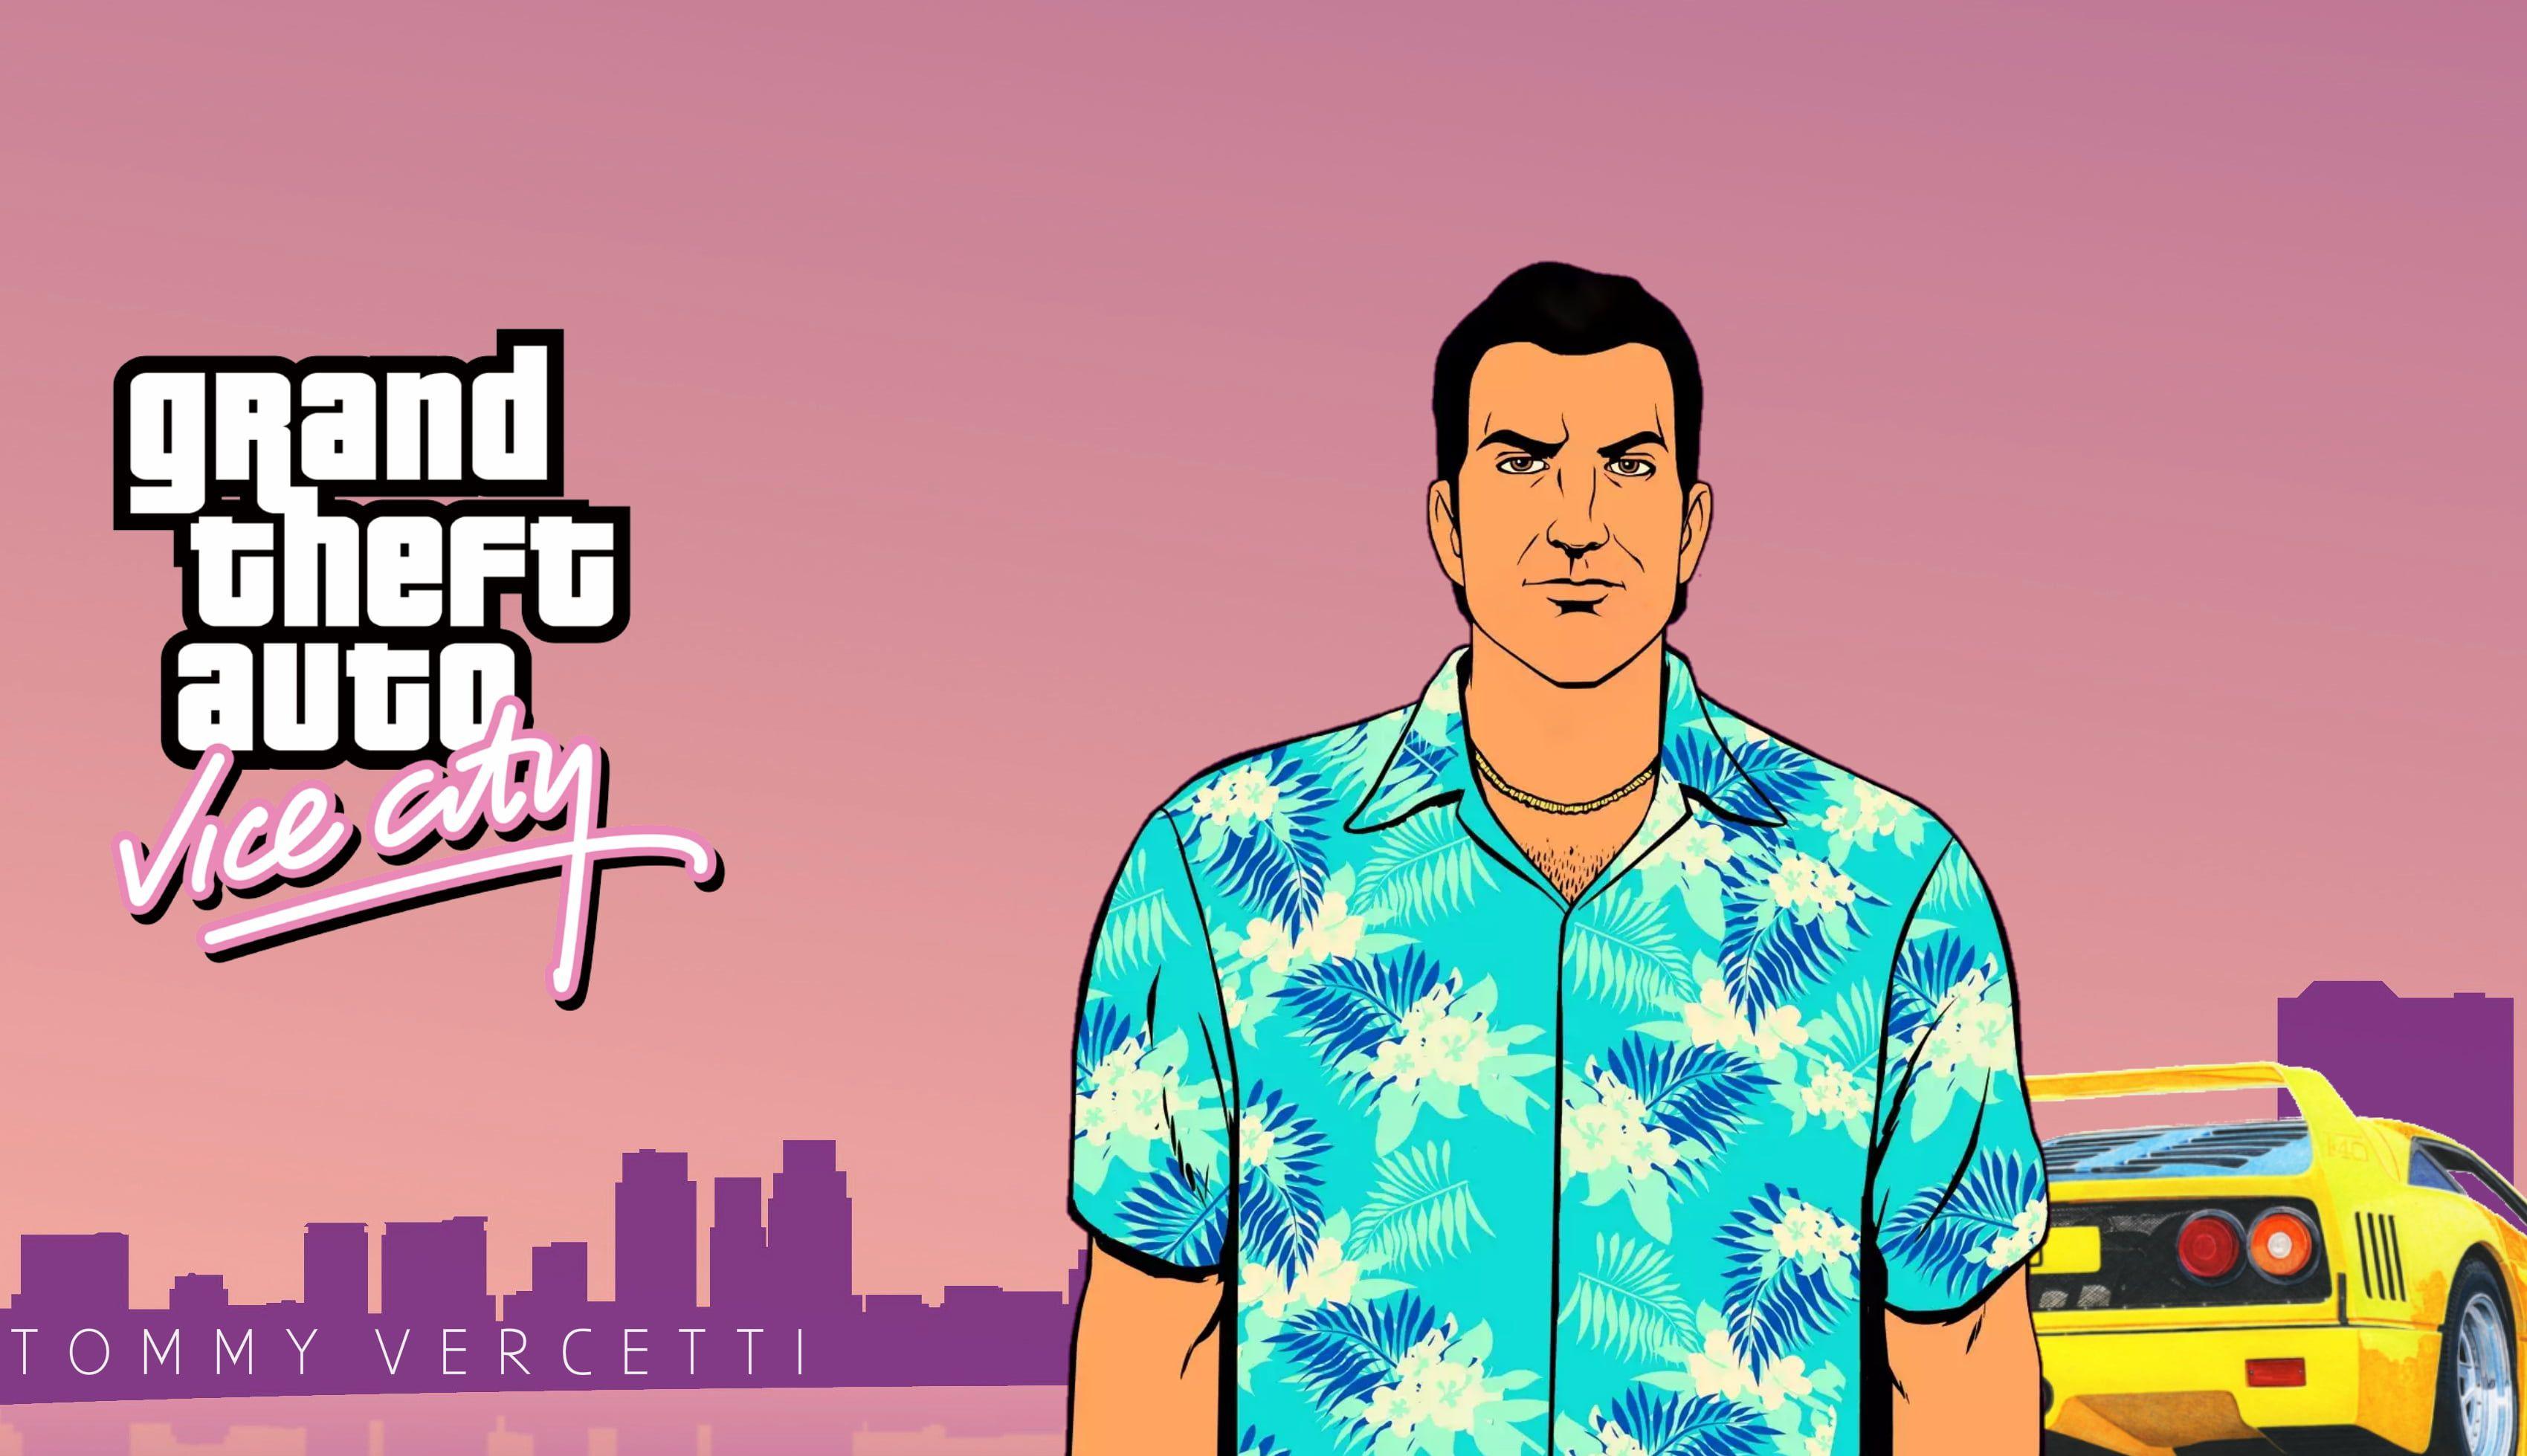 Grand Theft Auto Grand Theft Auto Vice City Tommy Vercetti 2k Wallpaper Hdwallpaper Desktop Gta Grand Theft Auto Grand Theft Auto Games Aesthetic gta vice city wallpaper 4k